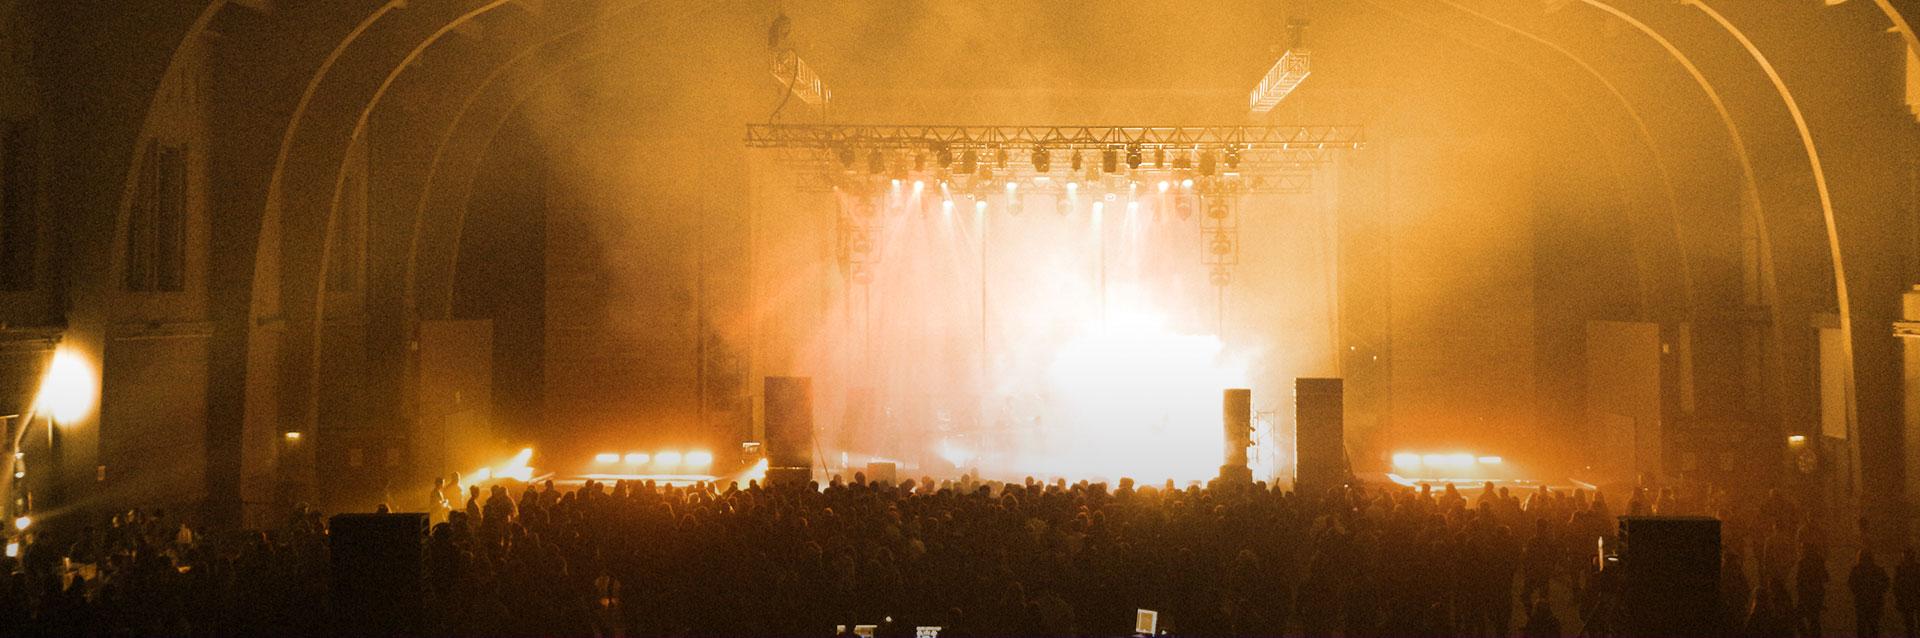 GrandeHalle-Concert-Sepia